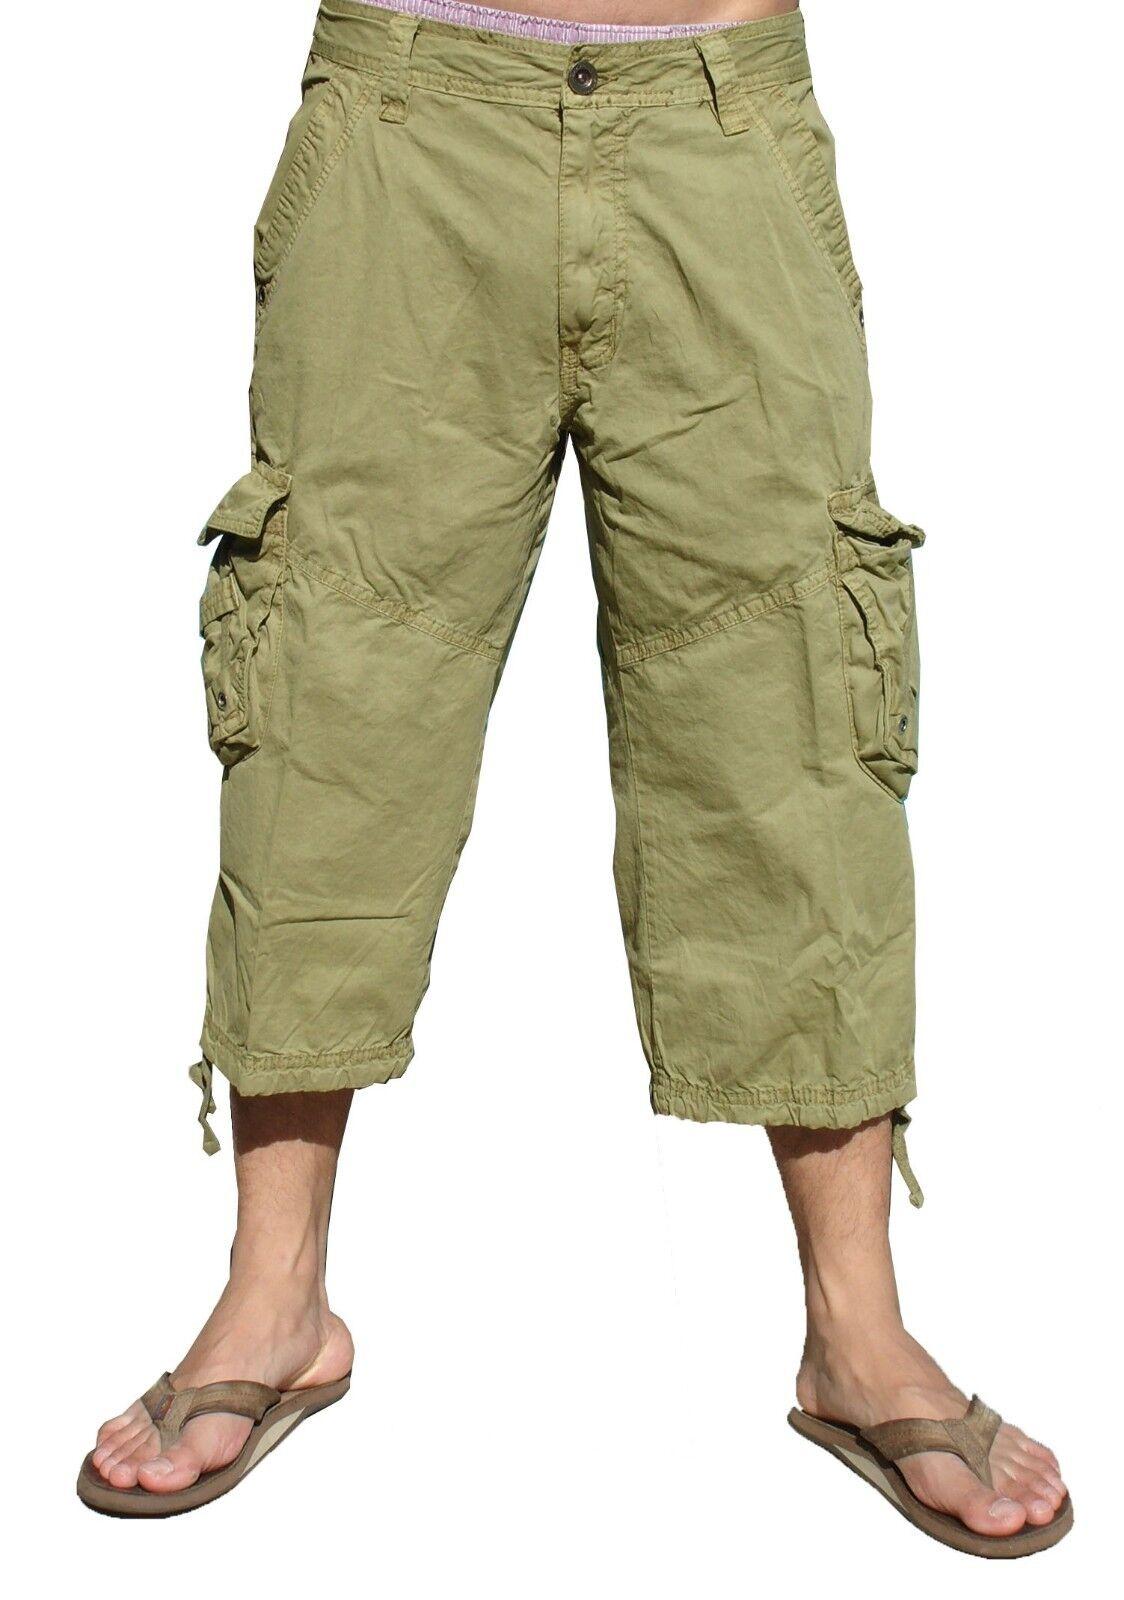 Mens 100% Cotton Cargo Capri Shorts, Inseam  19  Sizes 32 to 44  A7CA